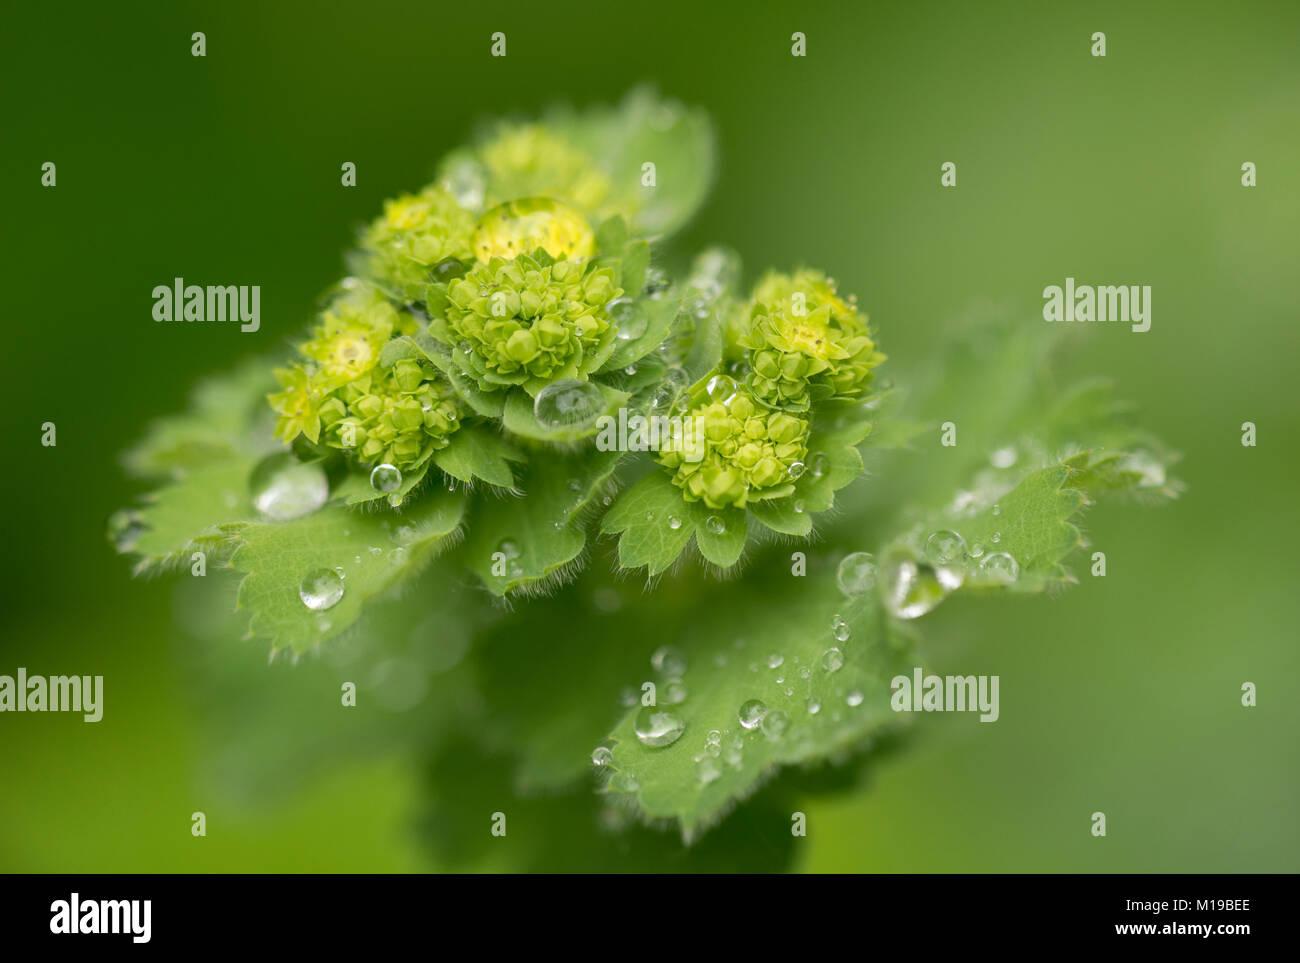 Alchemilla mollis - Frauenmantel - Stock Image